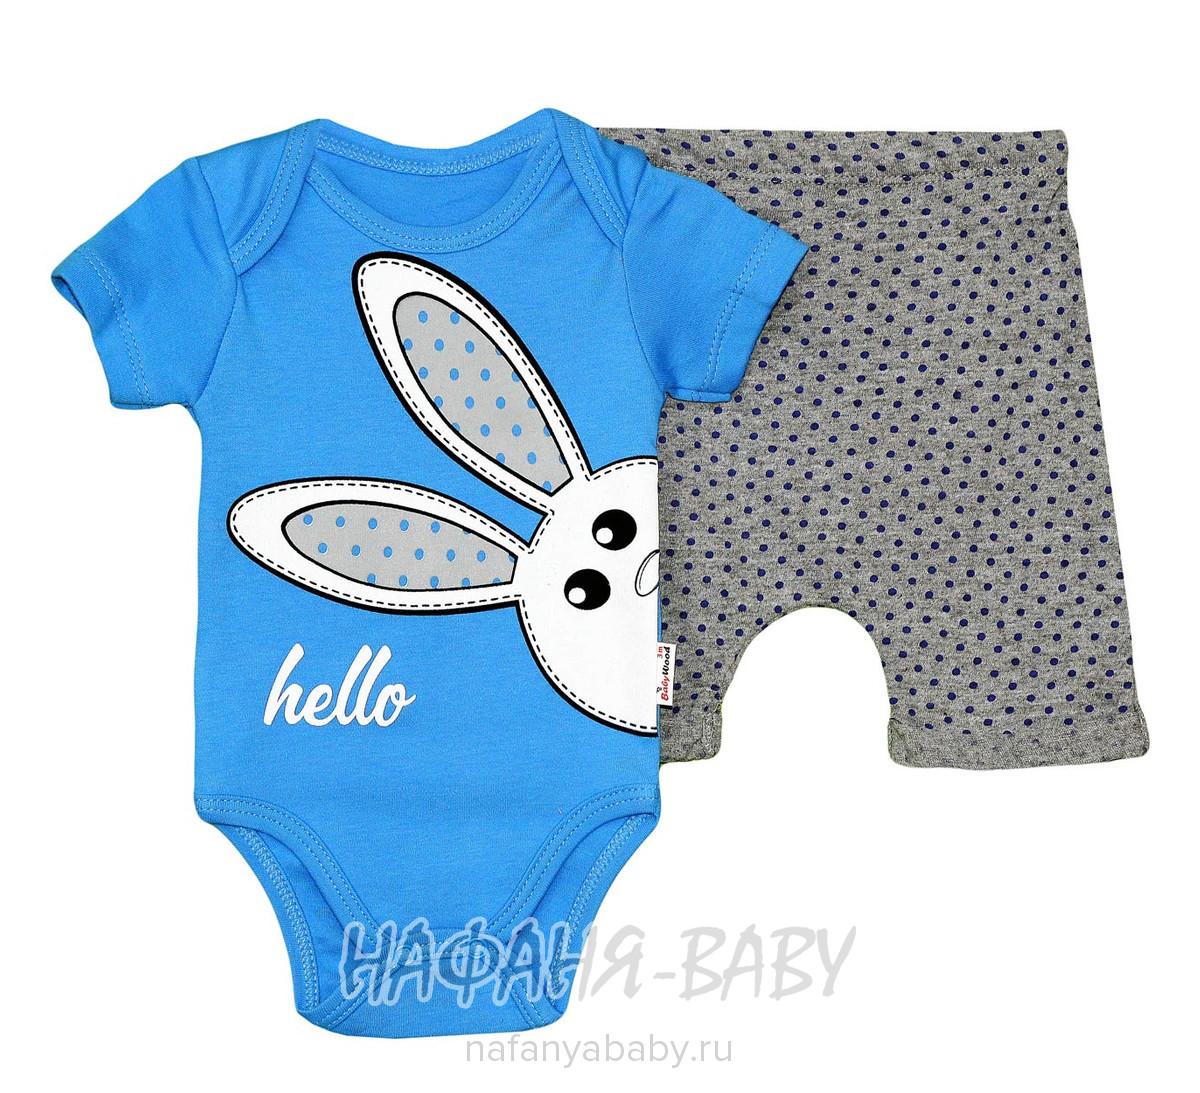 Детский комплект (боди + шорты)  Baby WOOD арт: 21132, 0-12 мес, цвет синий, оптом Турция